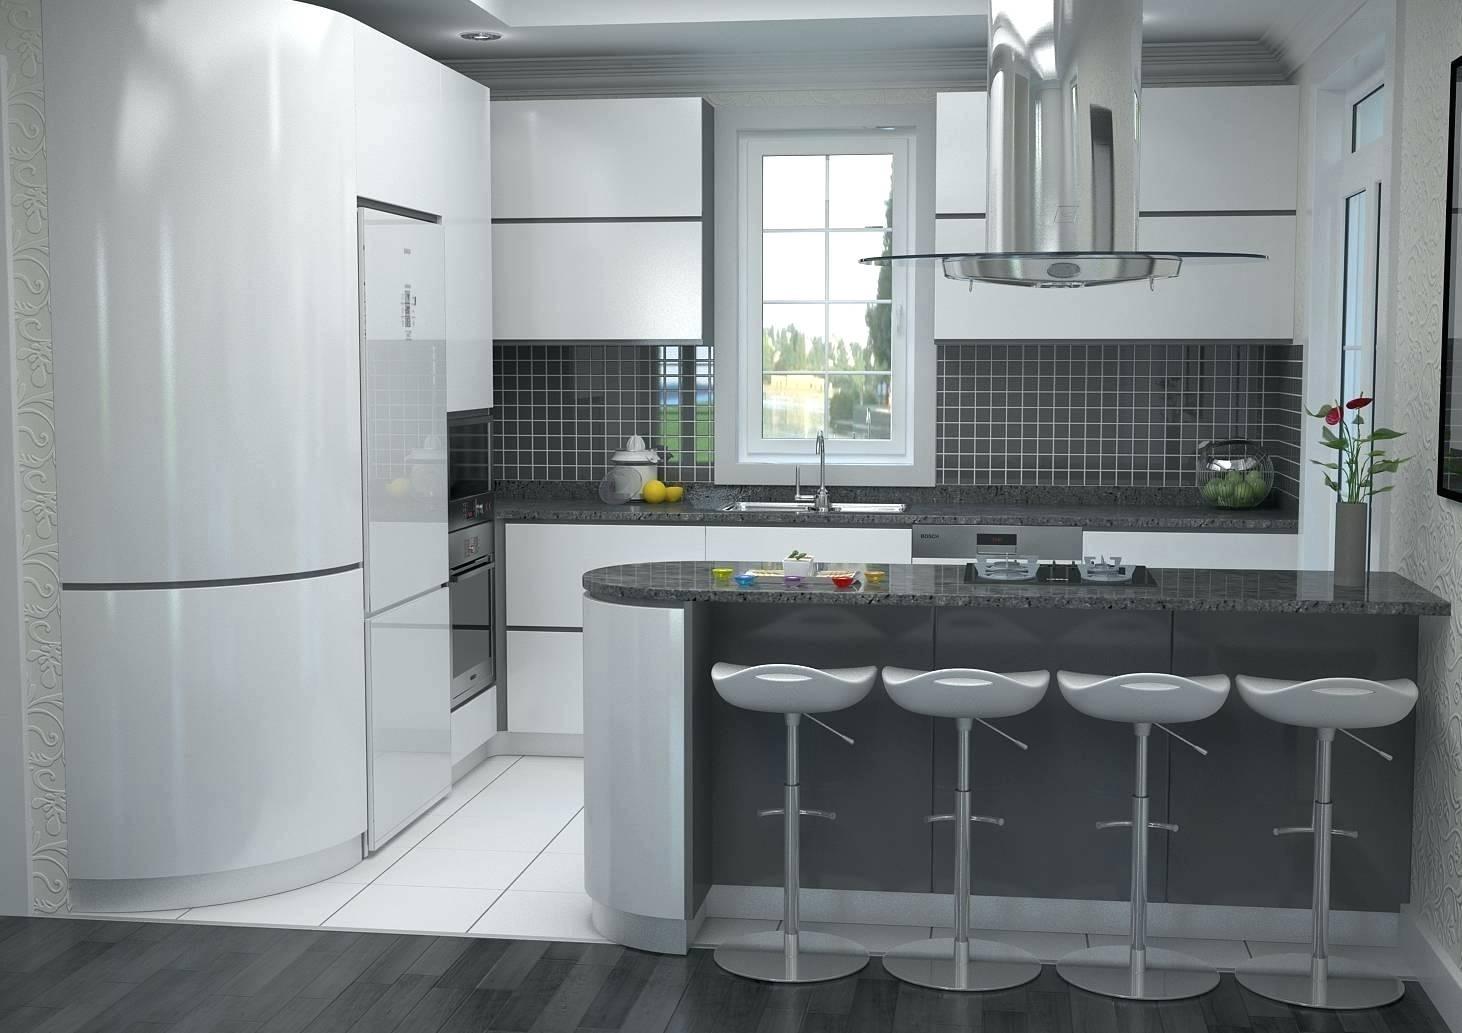 modele cuisine equipee but lille maison. Black Bedroom Furniture Sets. Home Design Ideas